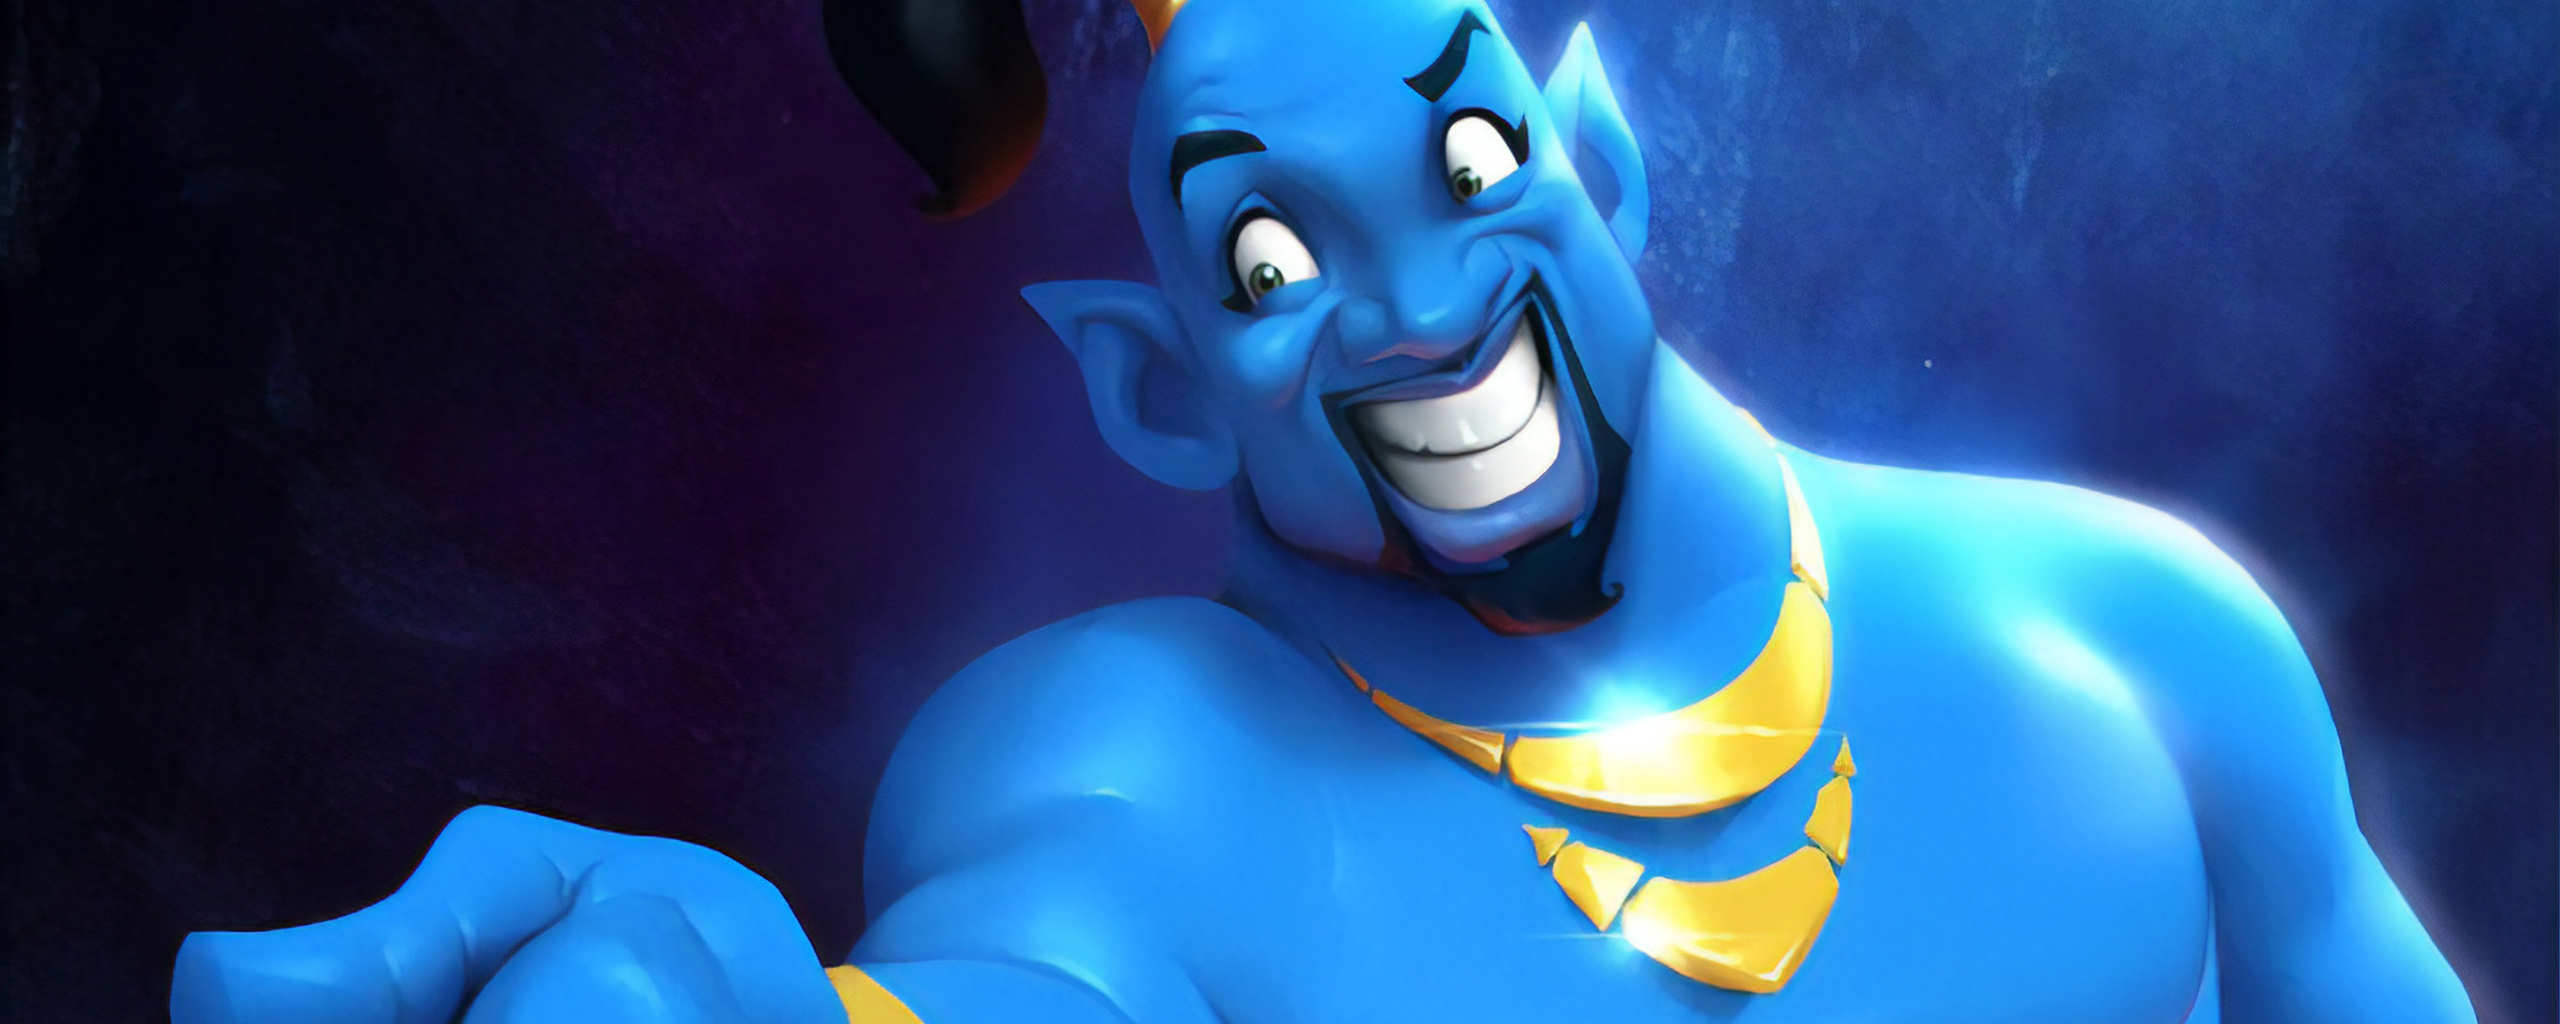 will-smith-as-genie-cartoon-art-pf.jpg